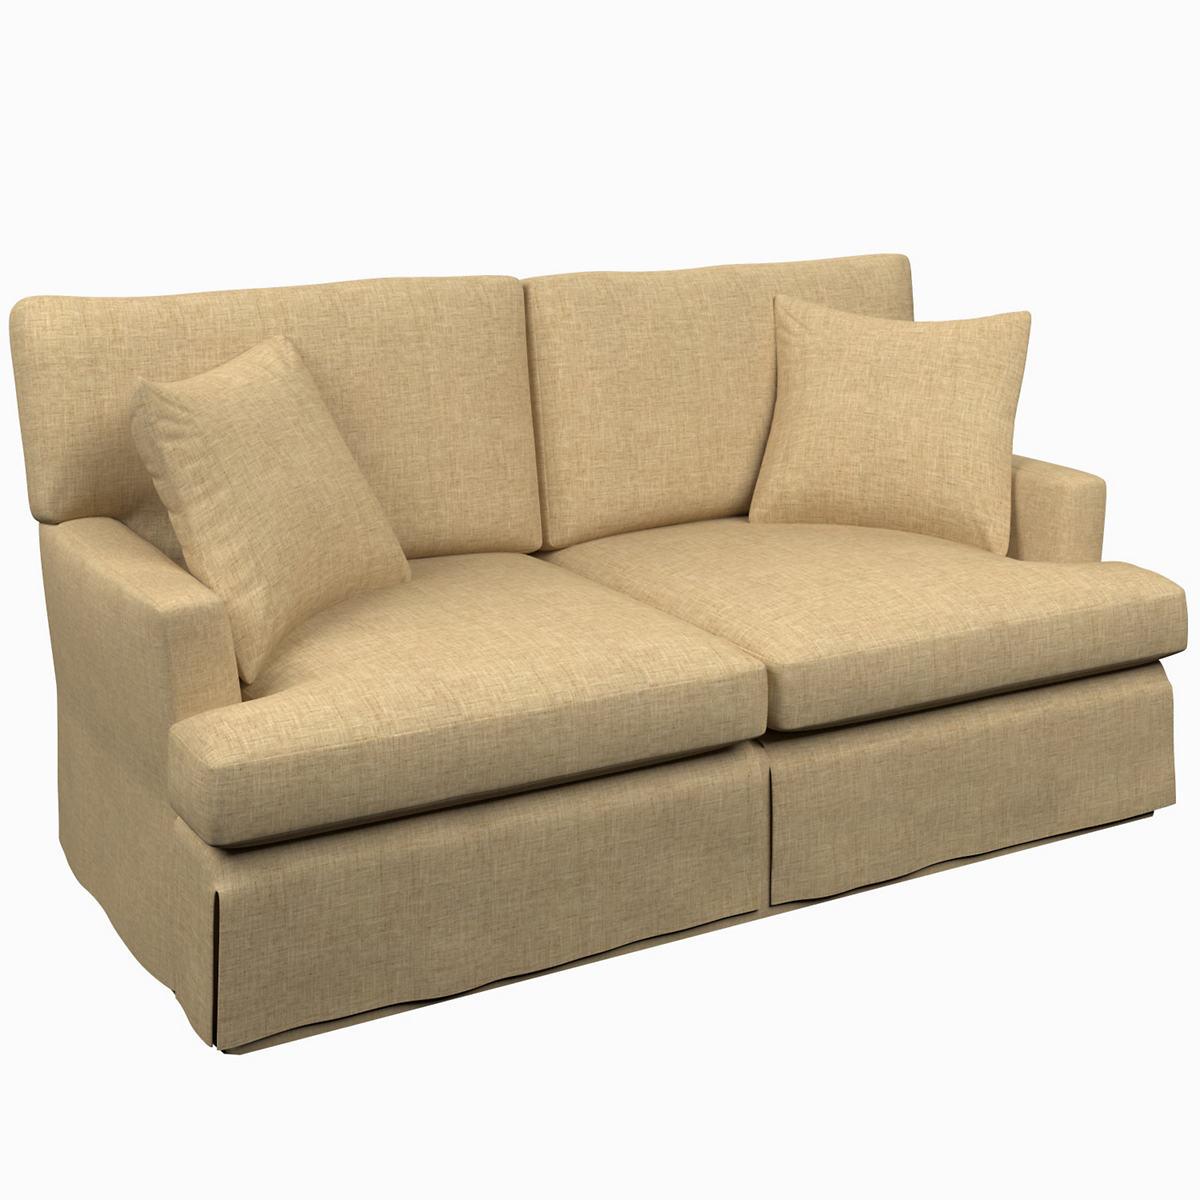 Greylock Natural Saybrook 2 Seater Upholstered Sofa